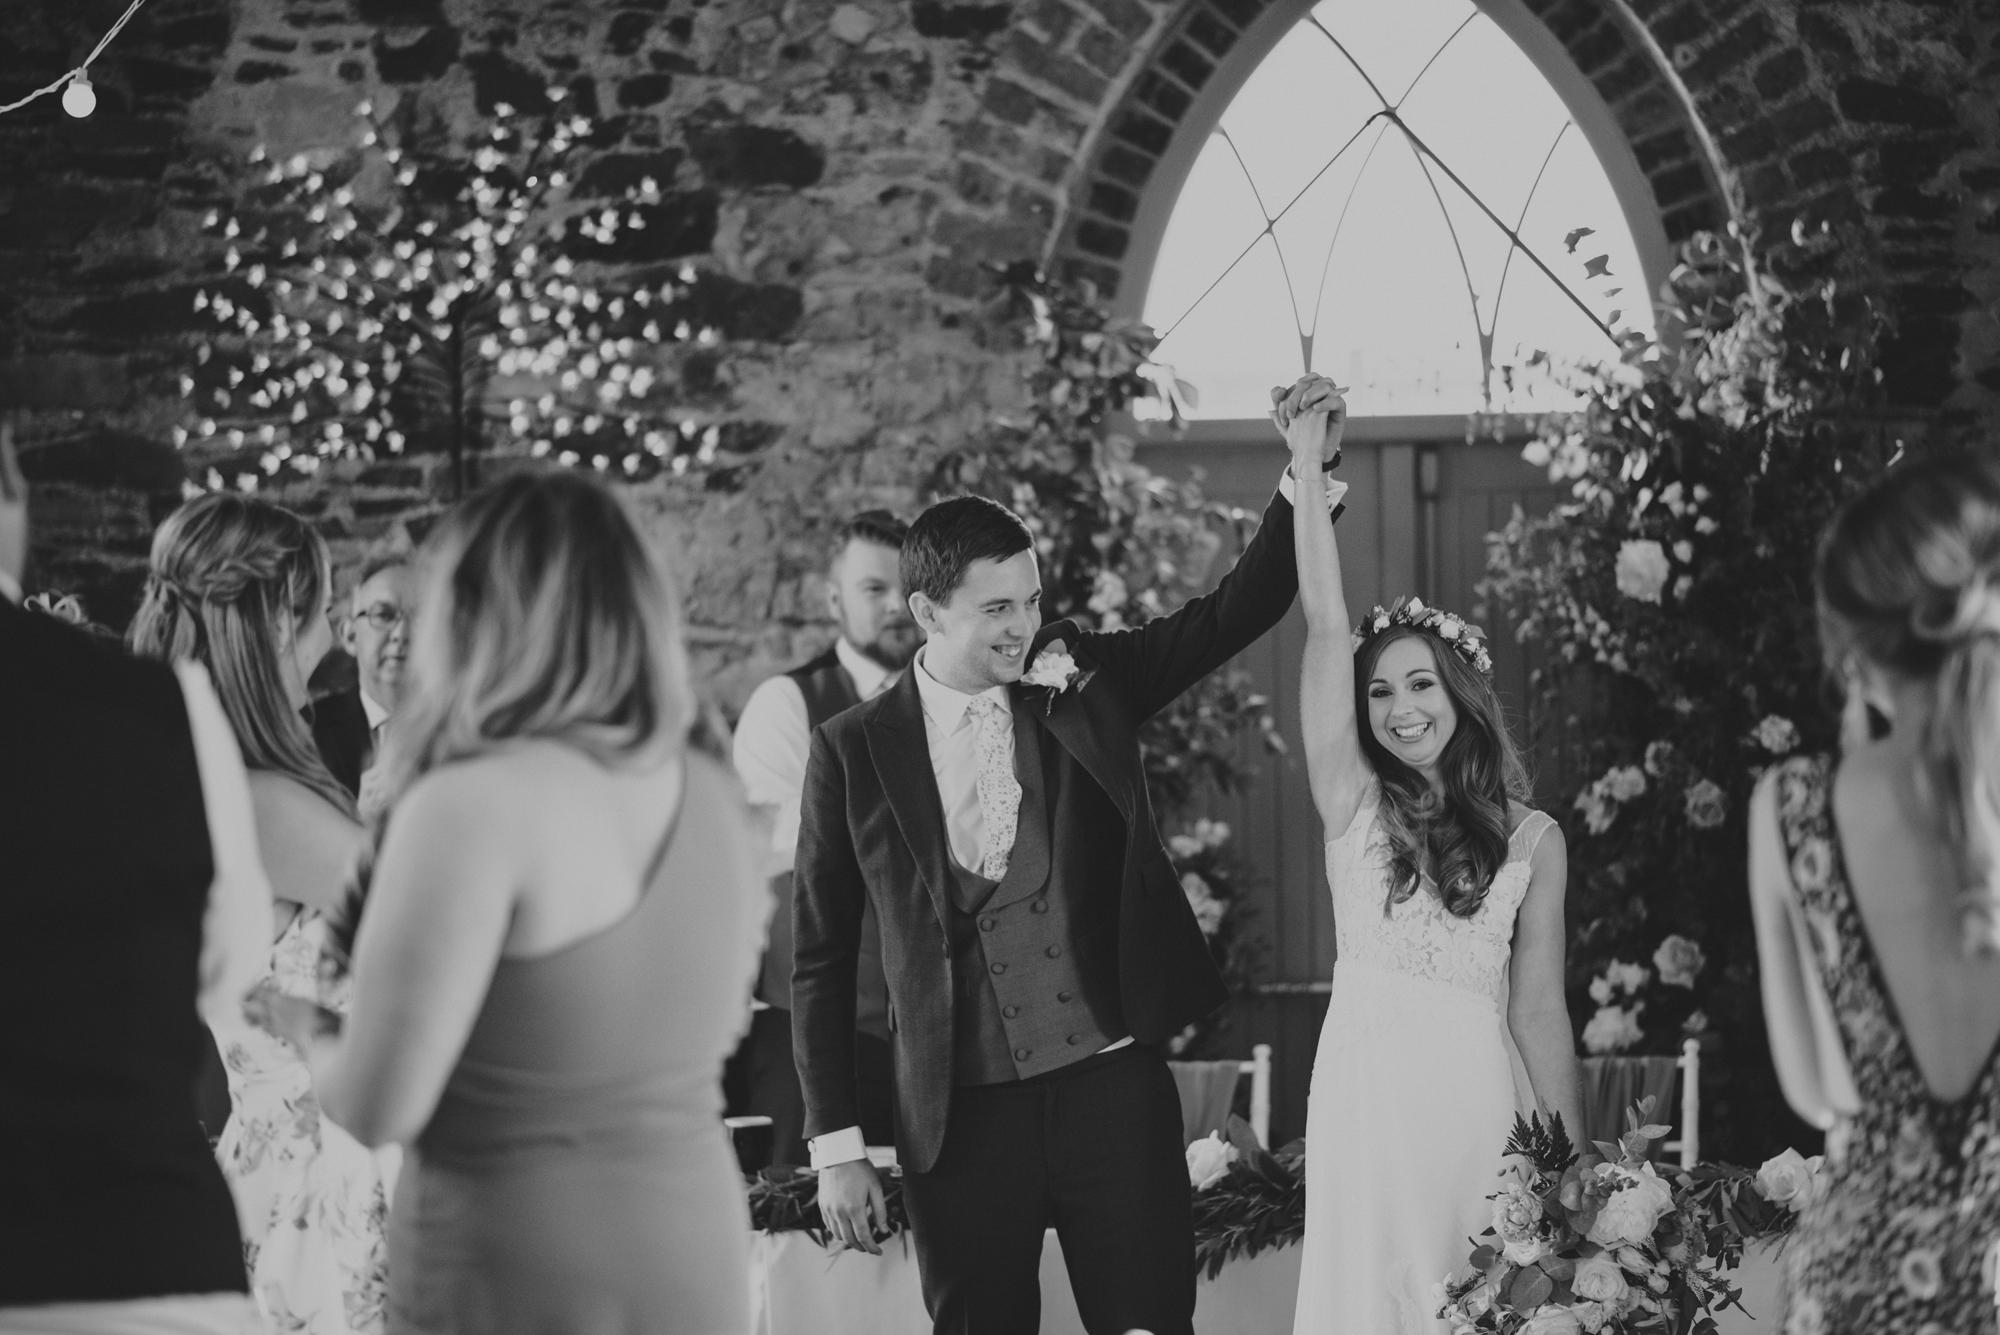 Orange_tree_house_Wedding_you_them_us_inspire_Weddings_35.jpg